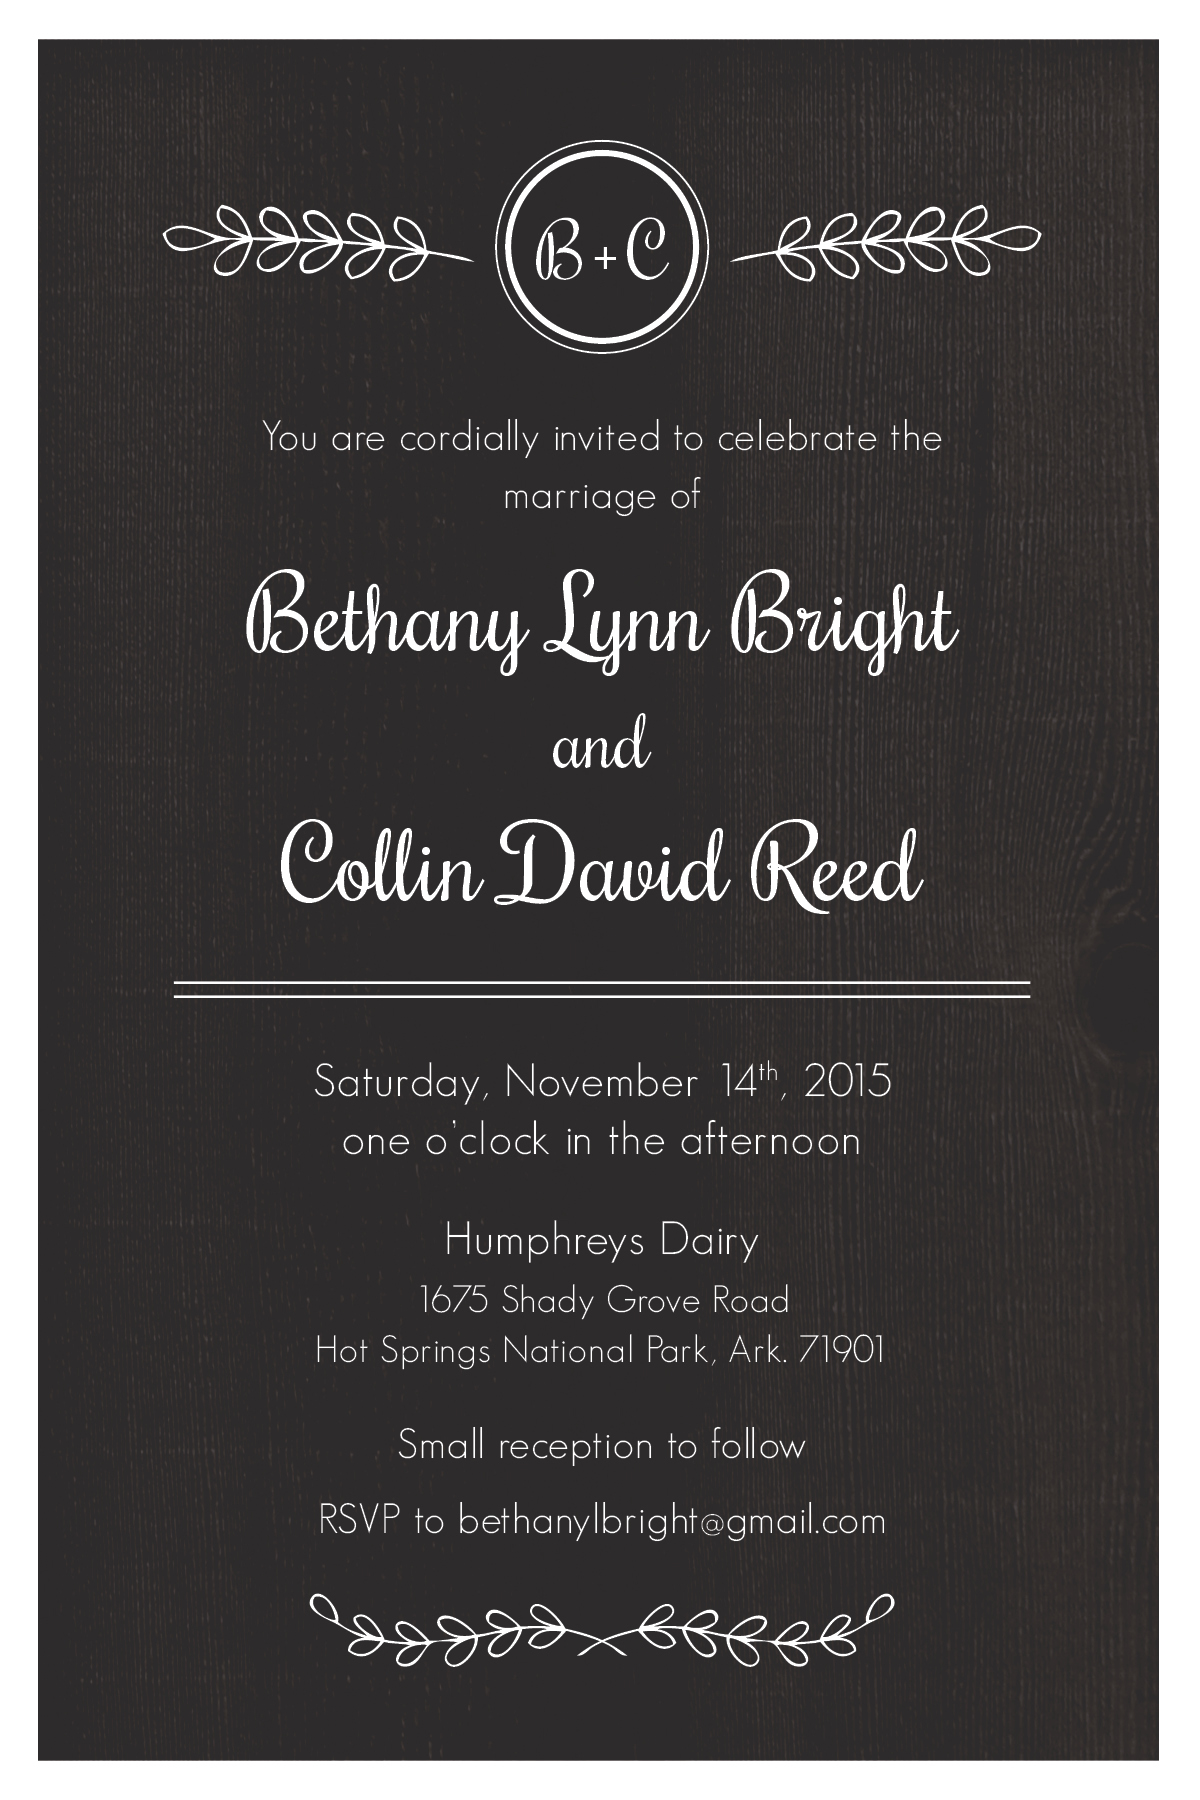 BrightReed Wedding Invitation Suite on Behance